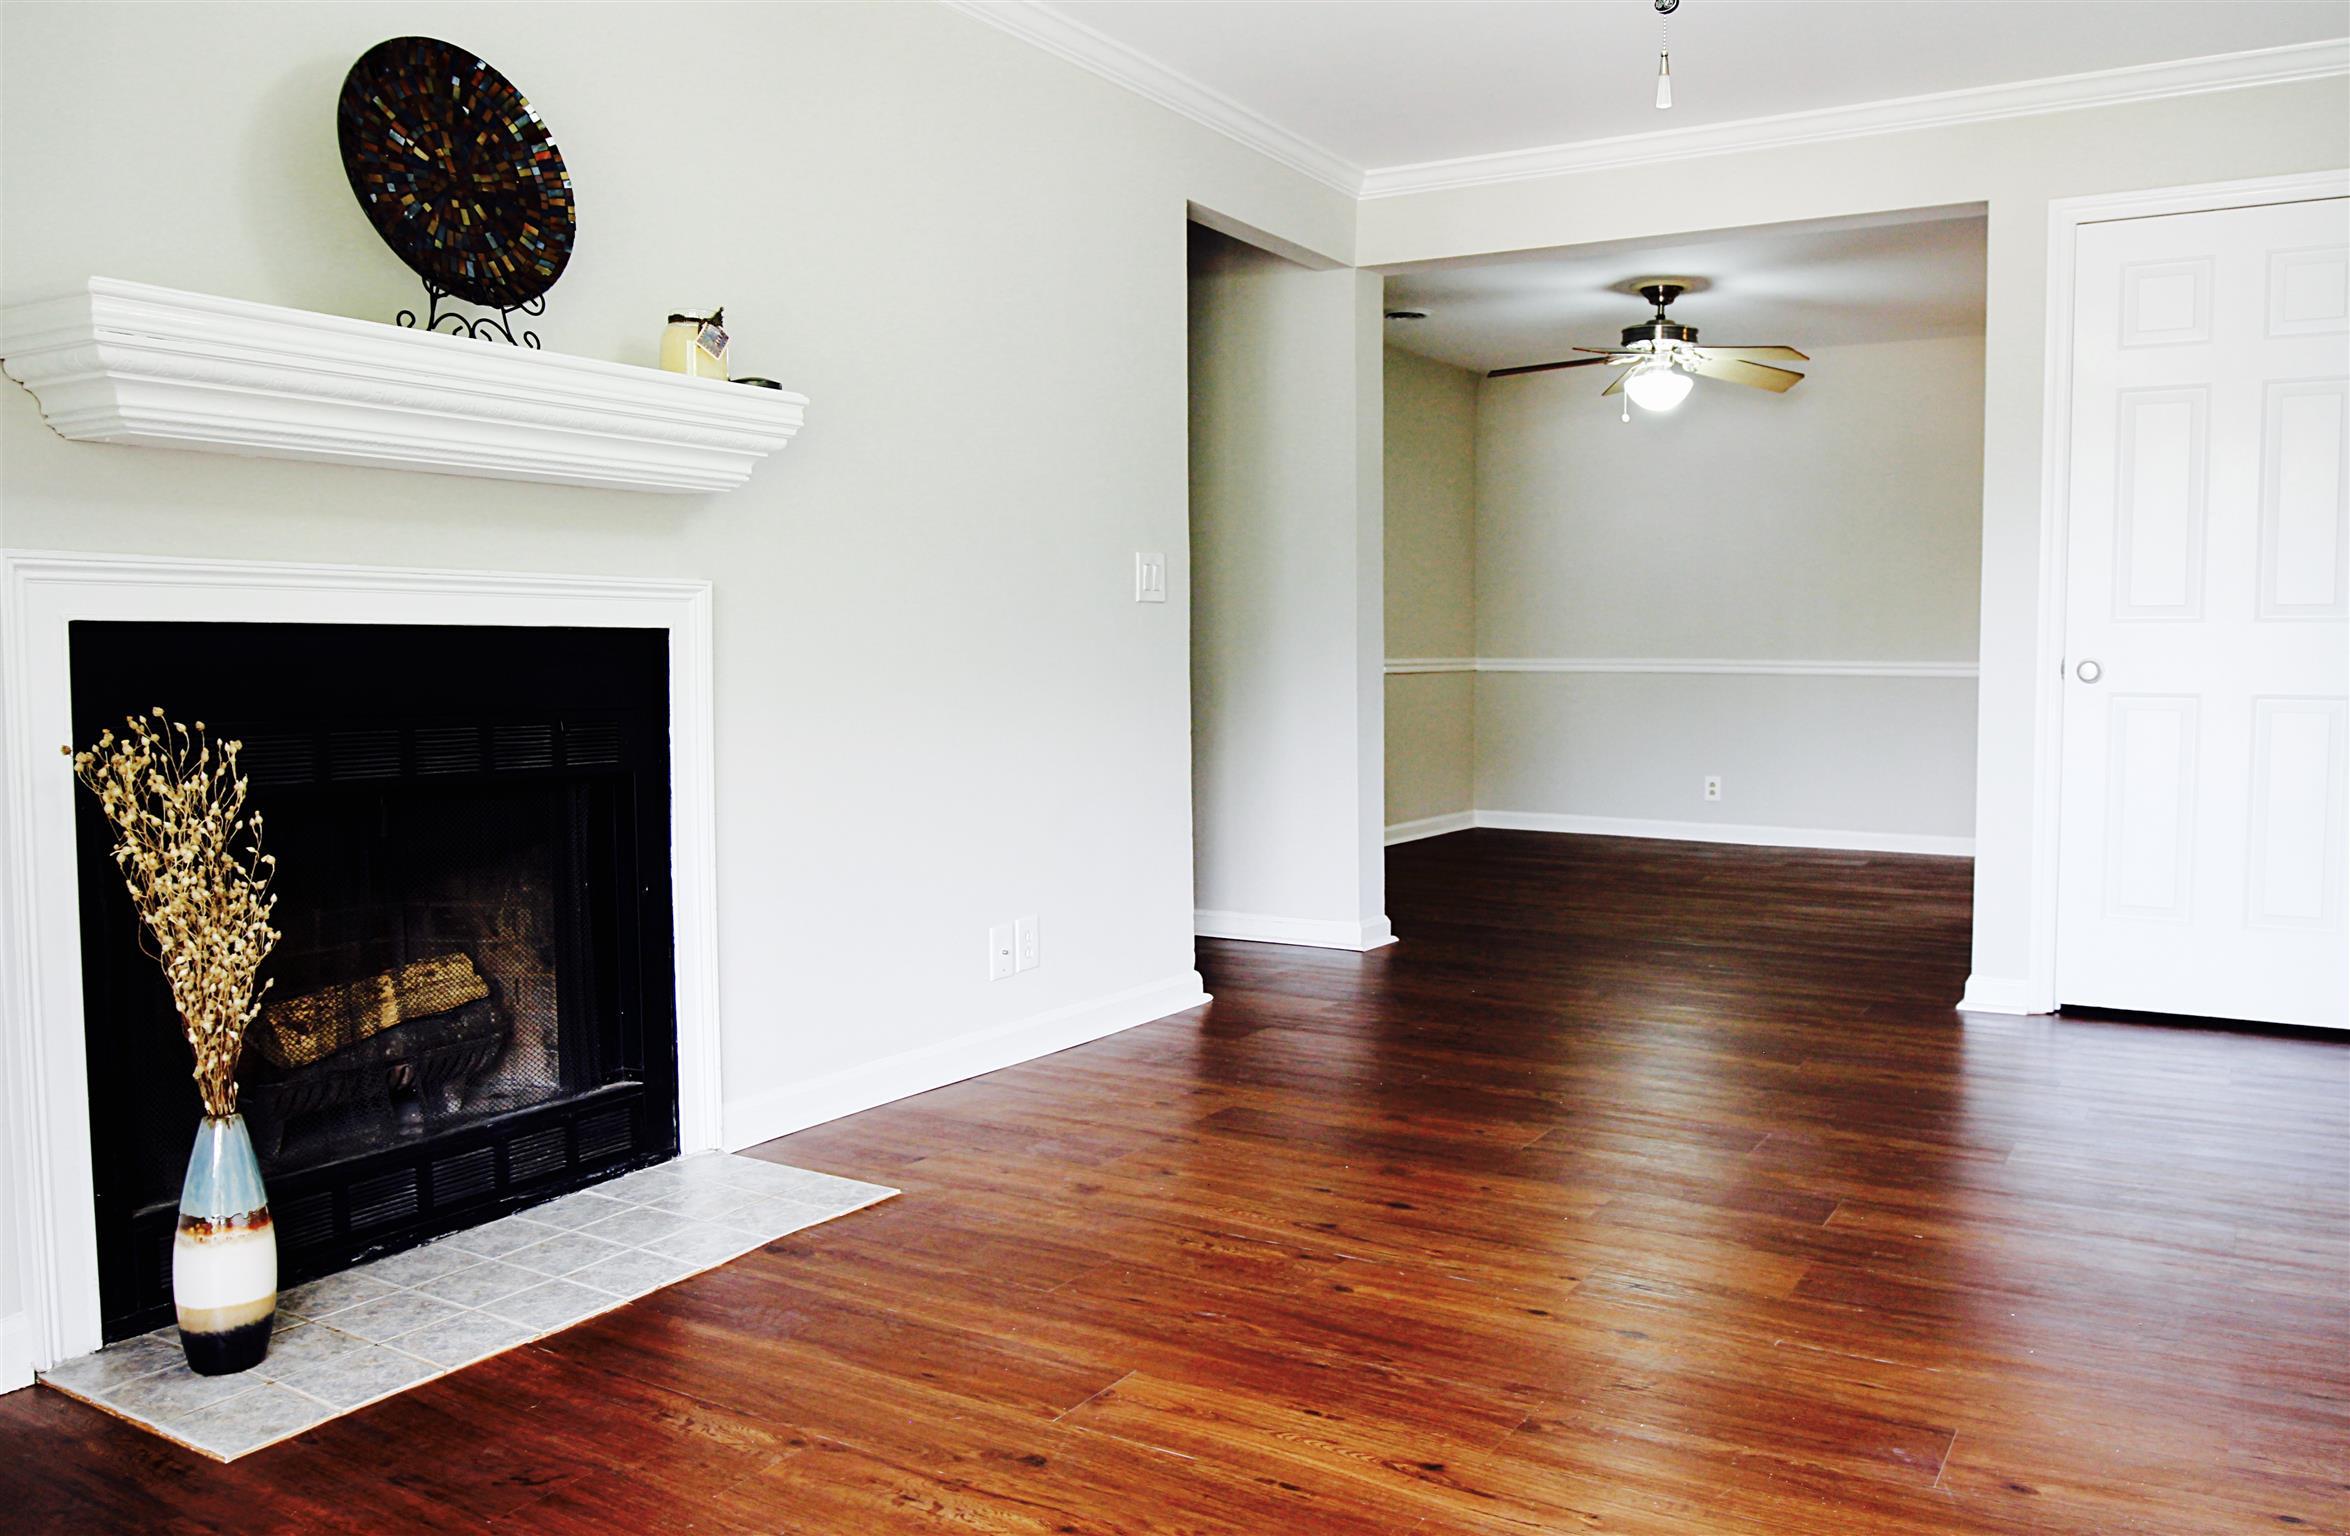 145 Hicks Rd, Nashville, TN 37221 - Nashville, TN real estate listing